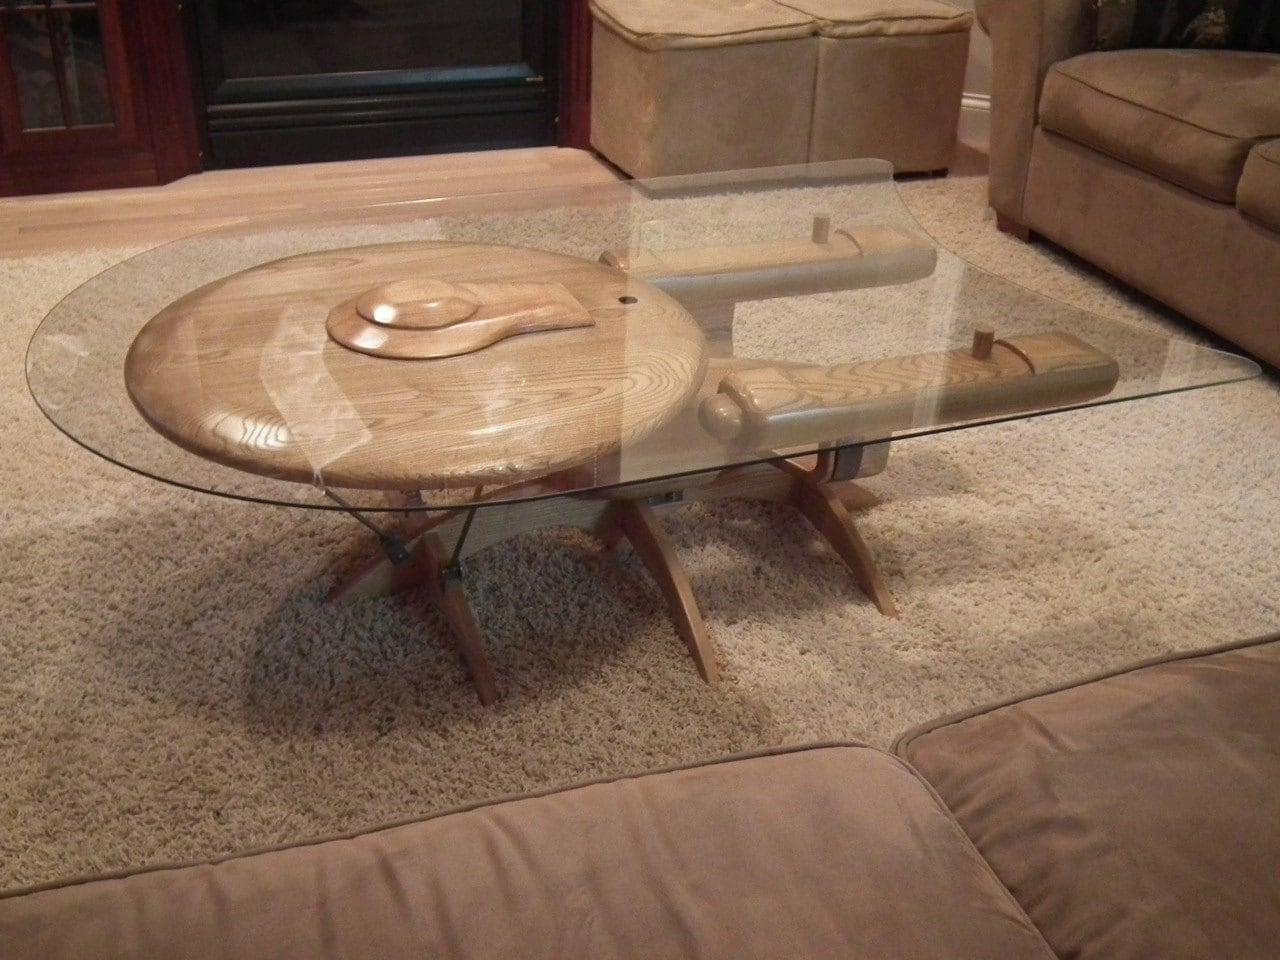 Star Trek Enterprise coffee table